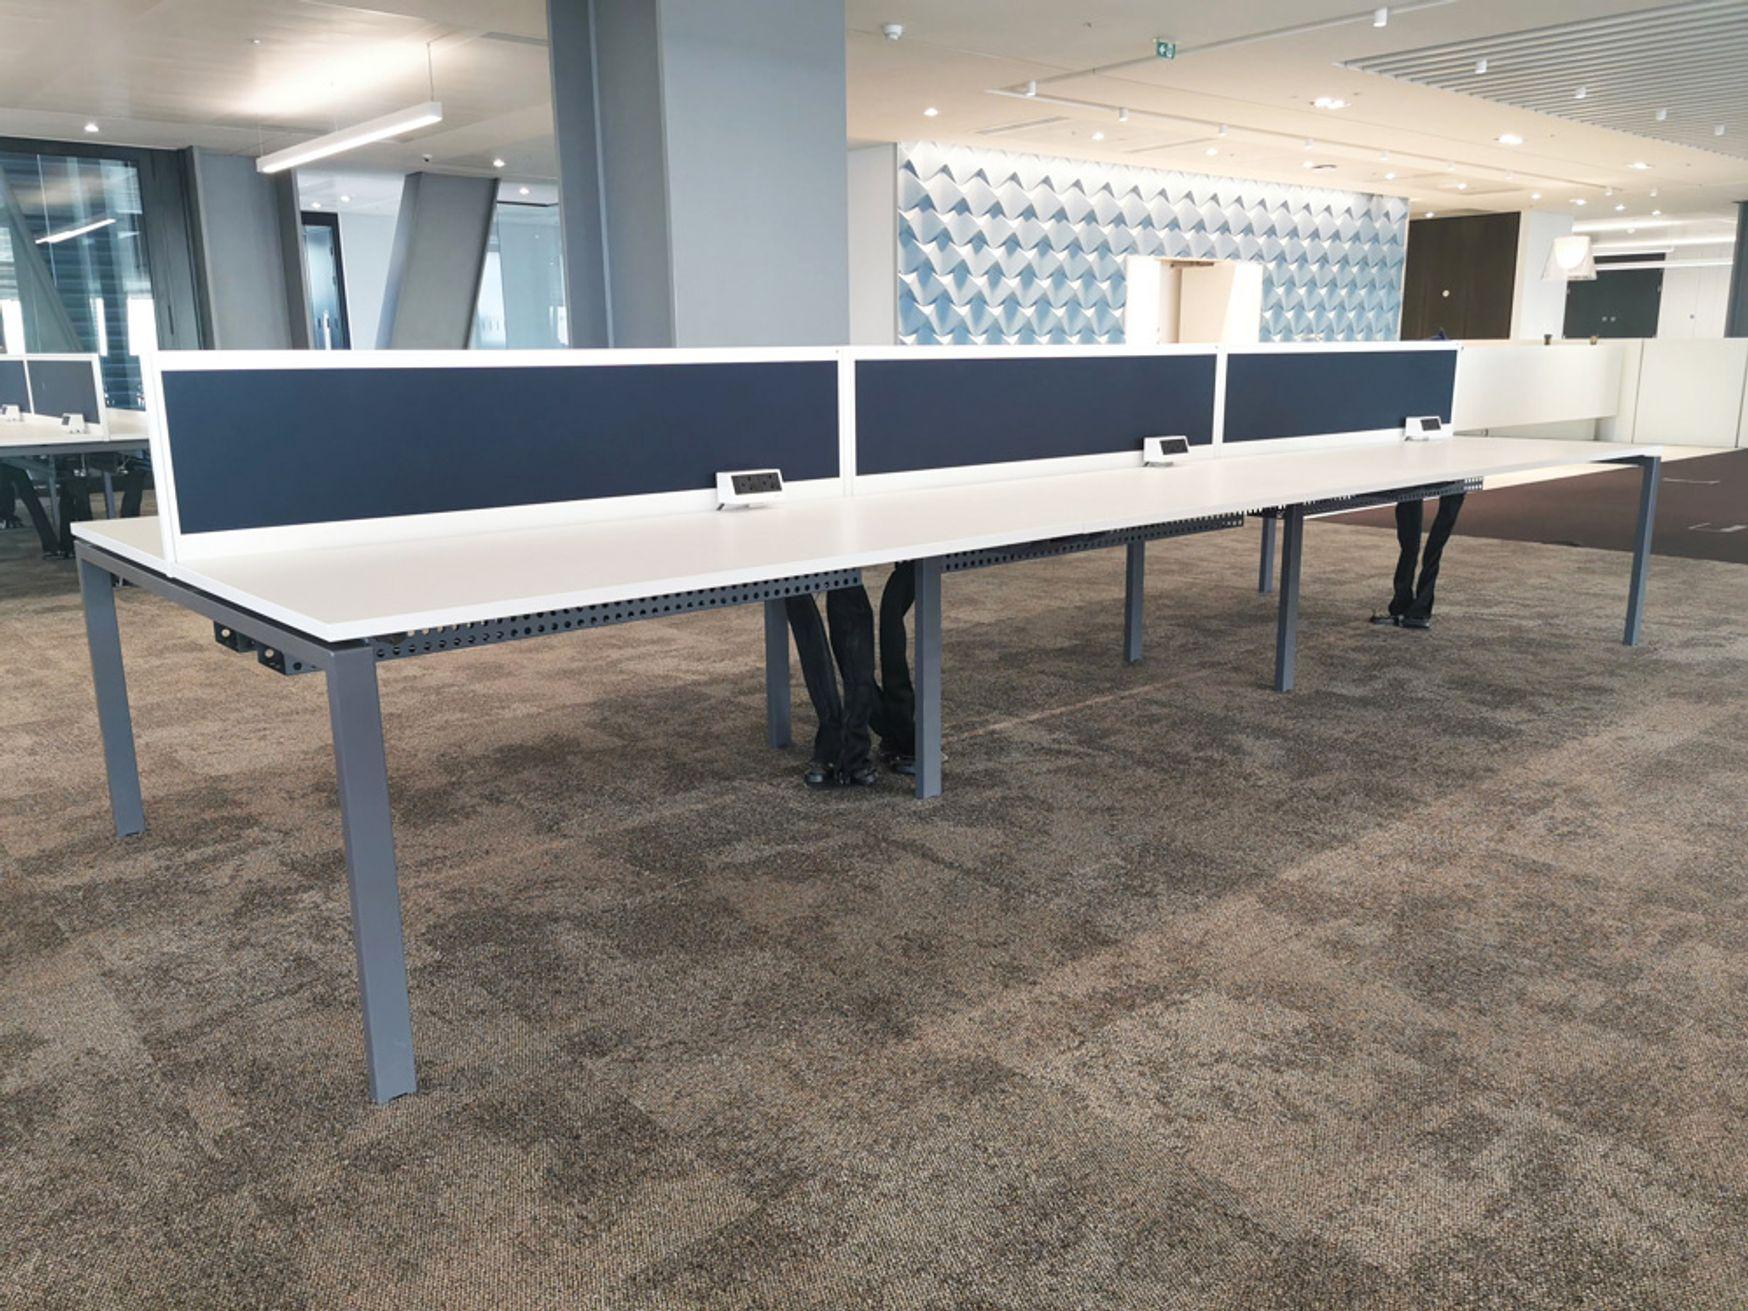 12 x 6-person sliding-top Task 'Team2' white bench desks with dividing screens.